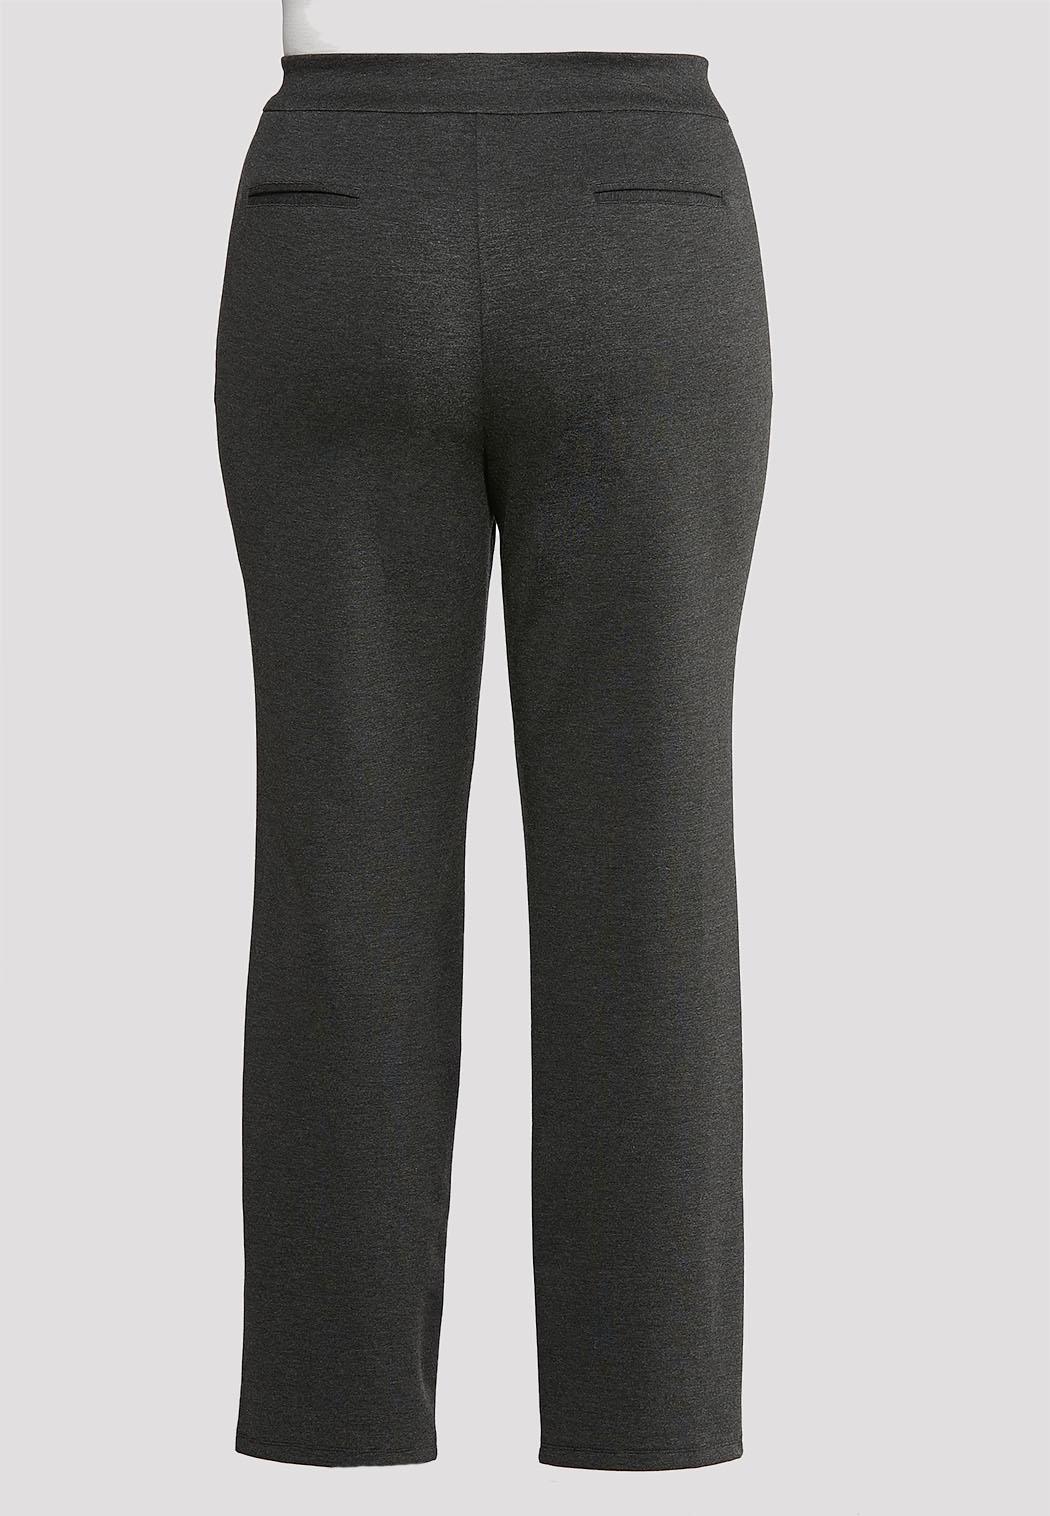 Plus Size Slim Leg Ponte Pants (Item #43918592)